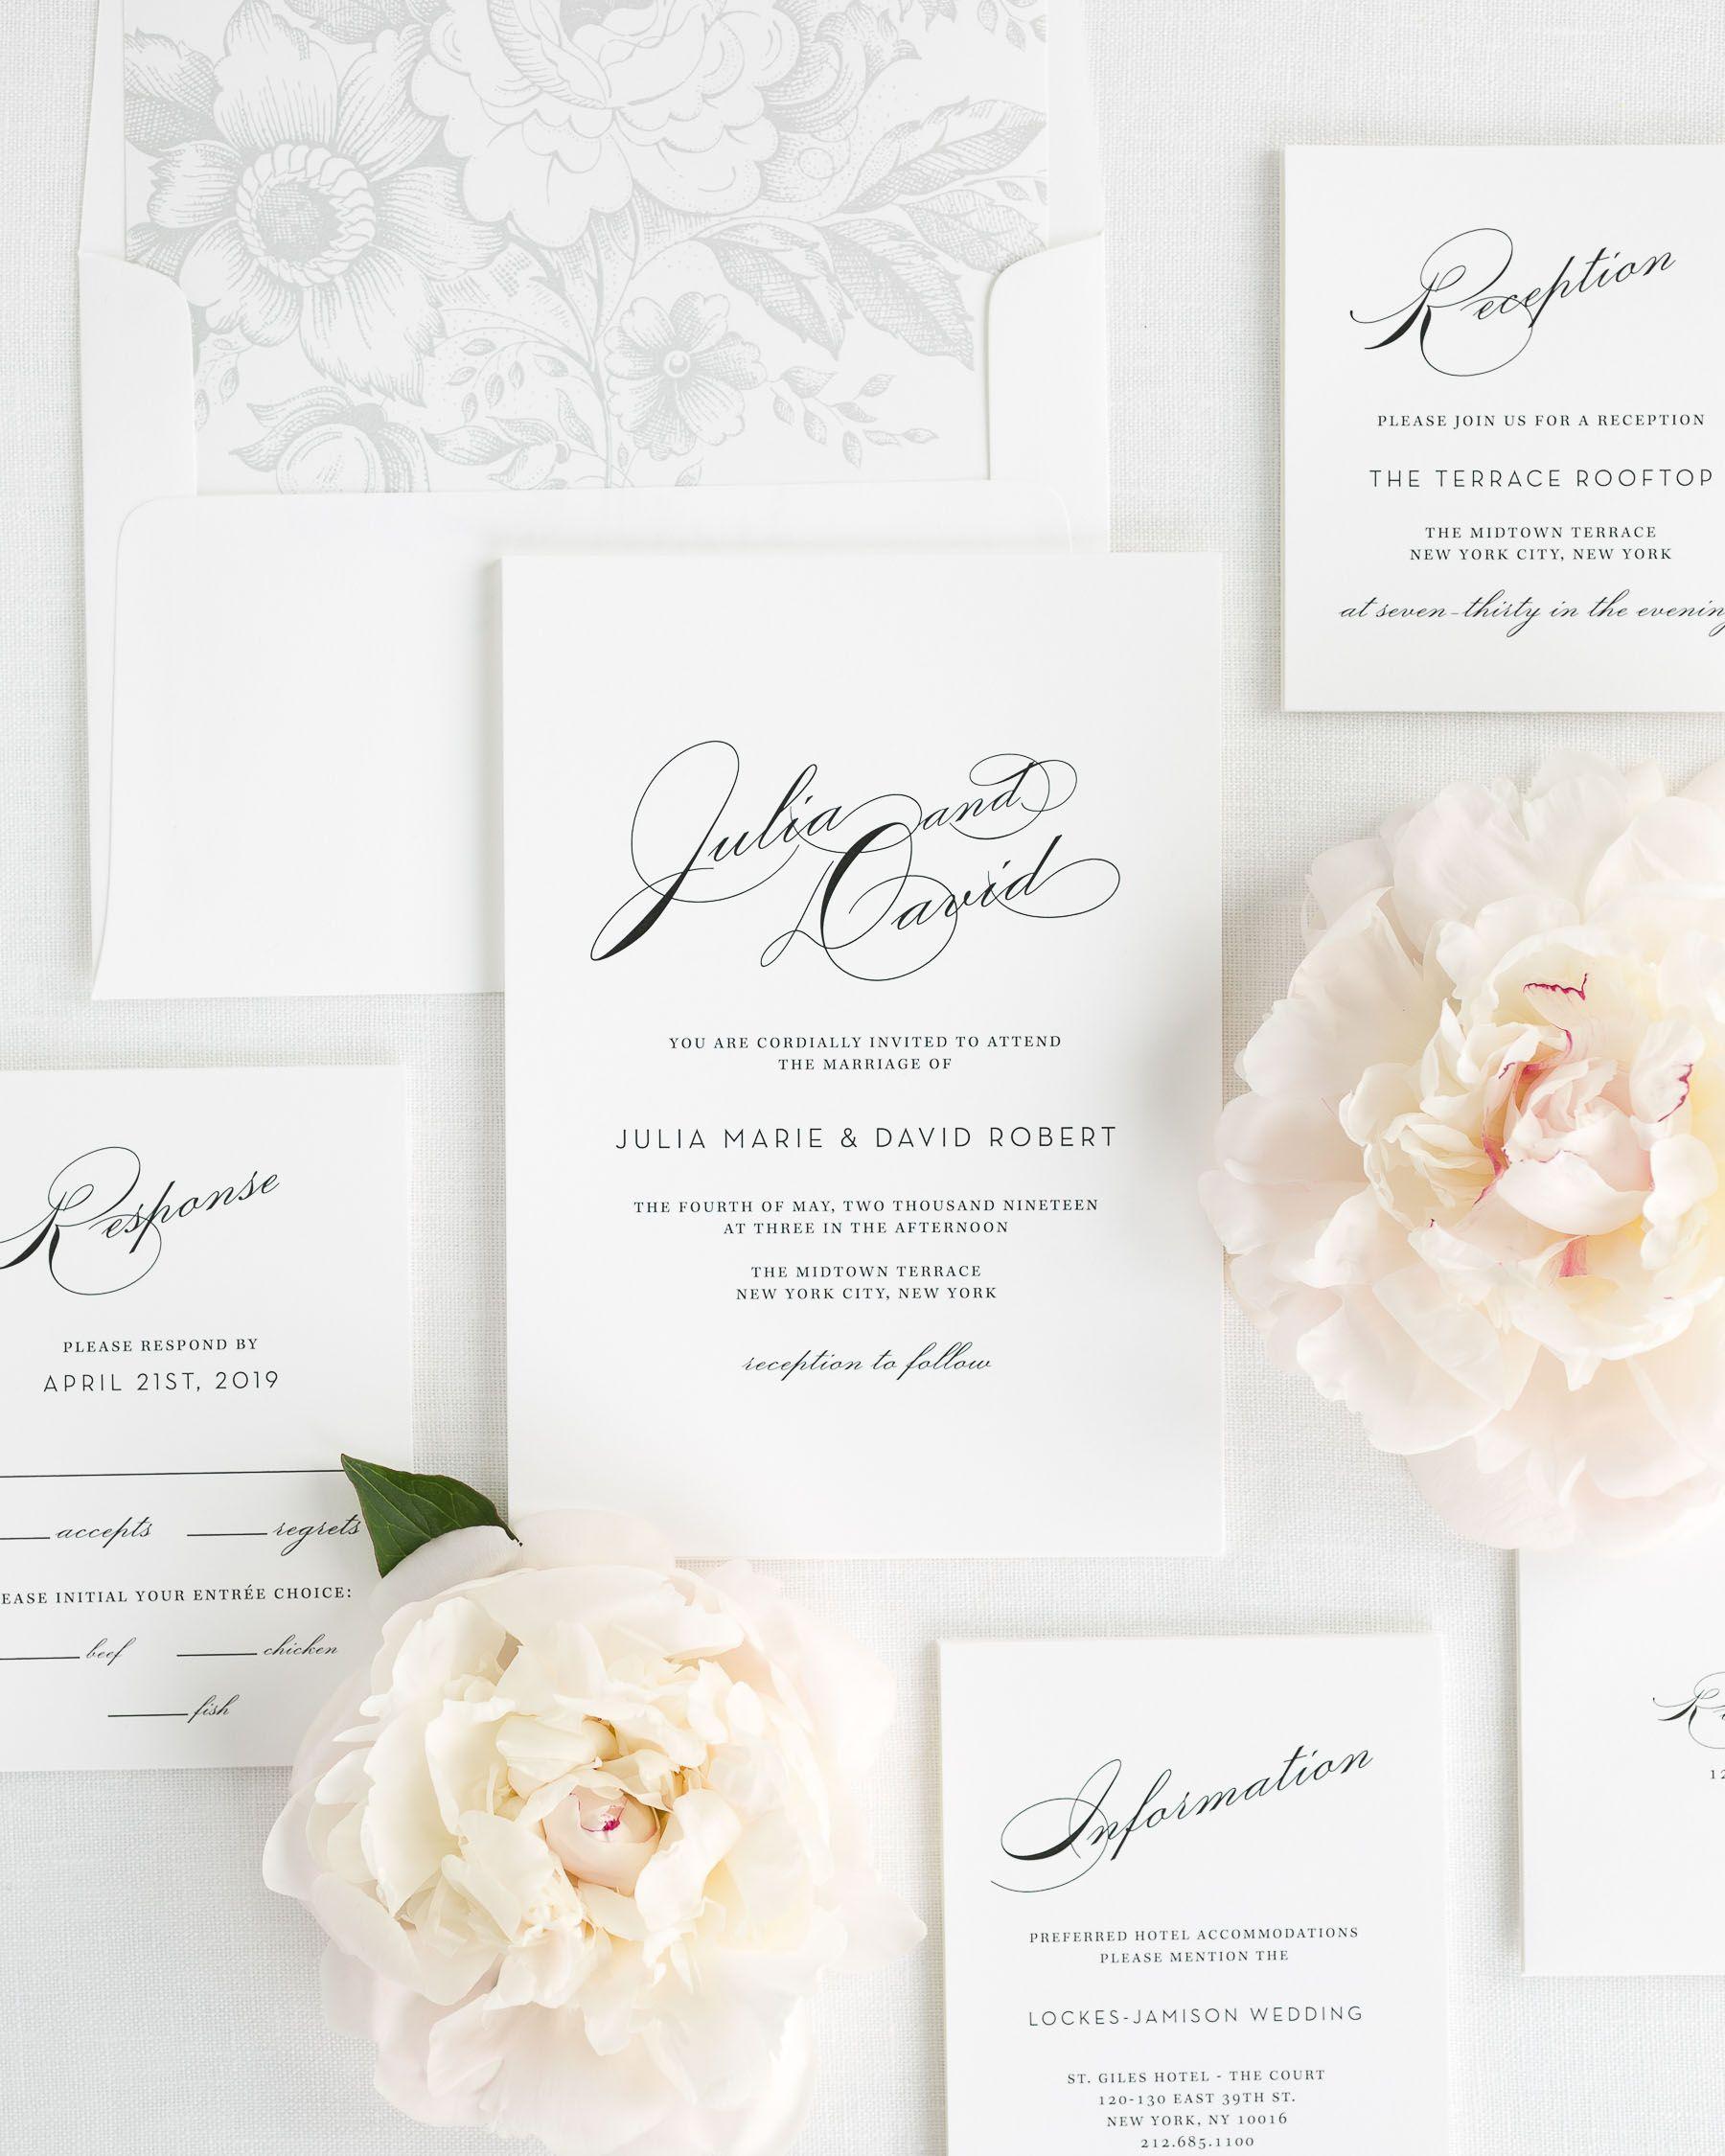 Vintage Glam Wedding Invitations: Vintage Glam Wedding Invitations In 2019